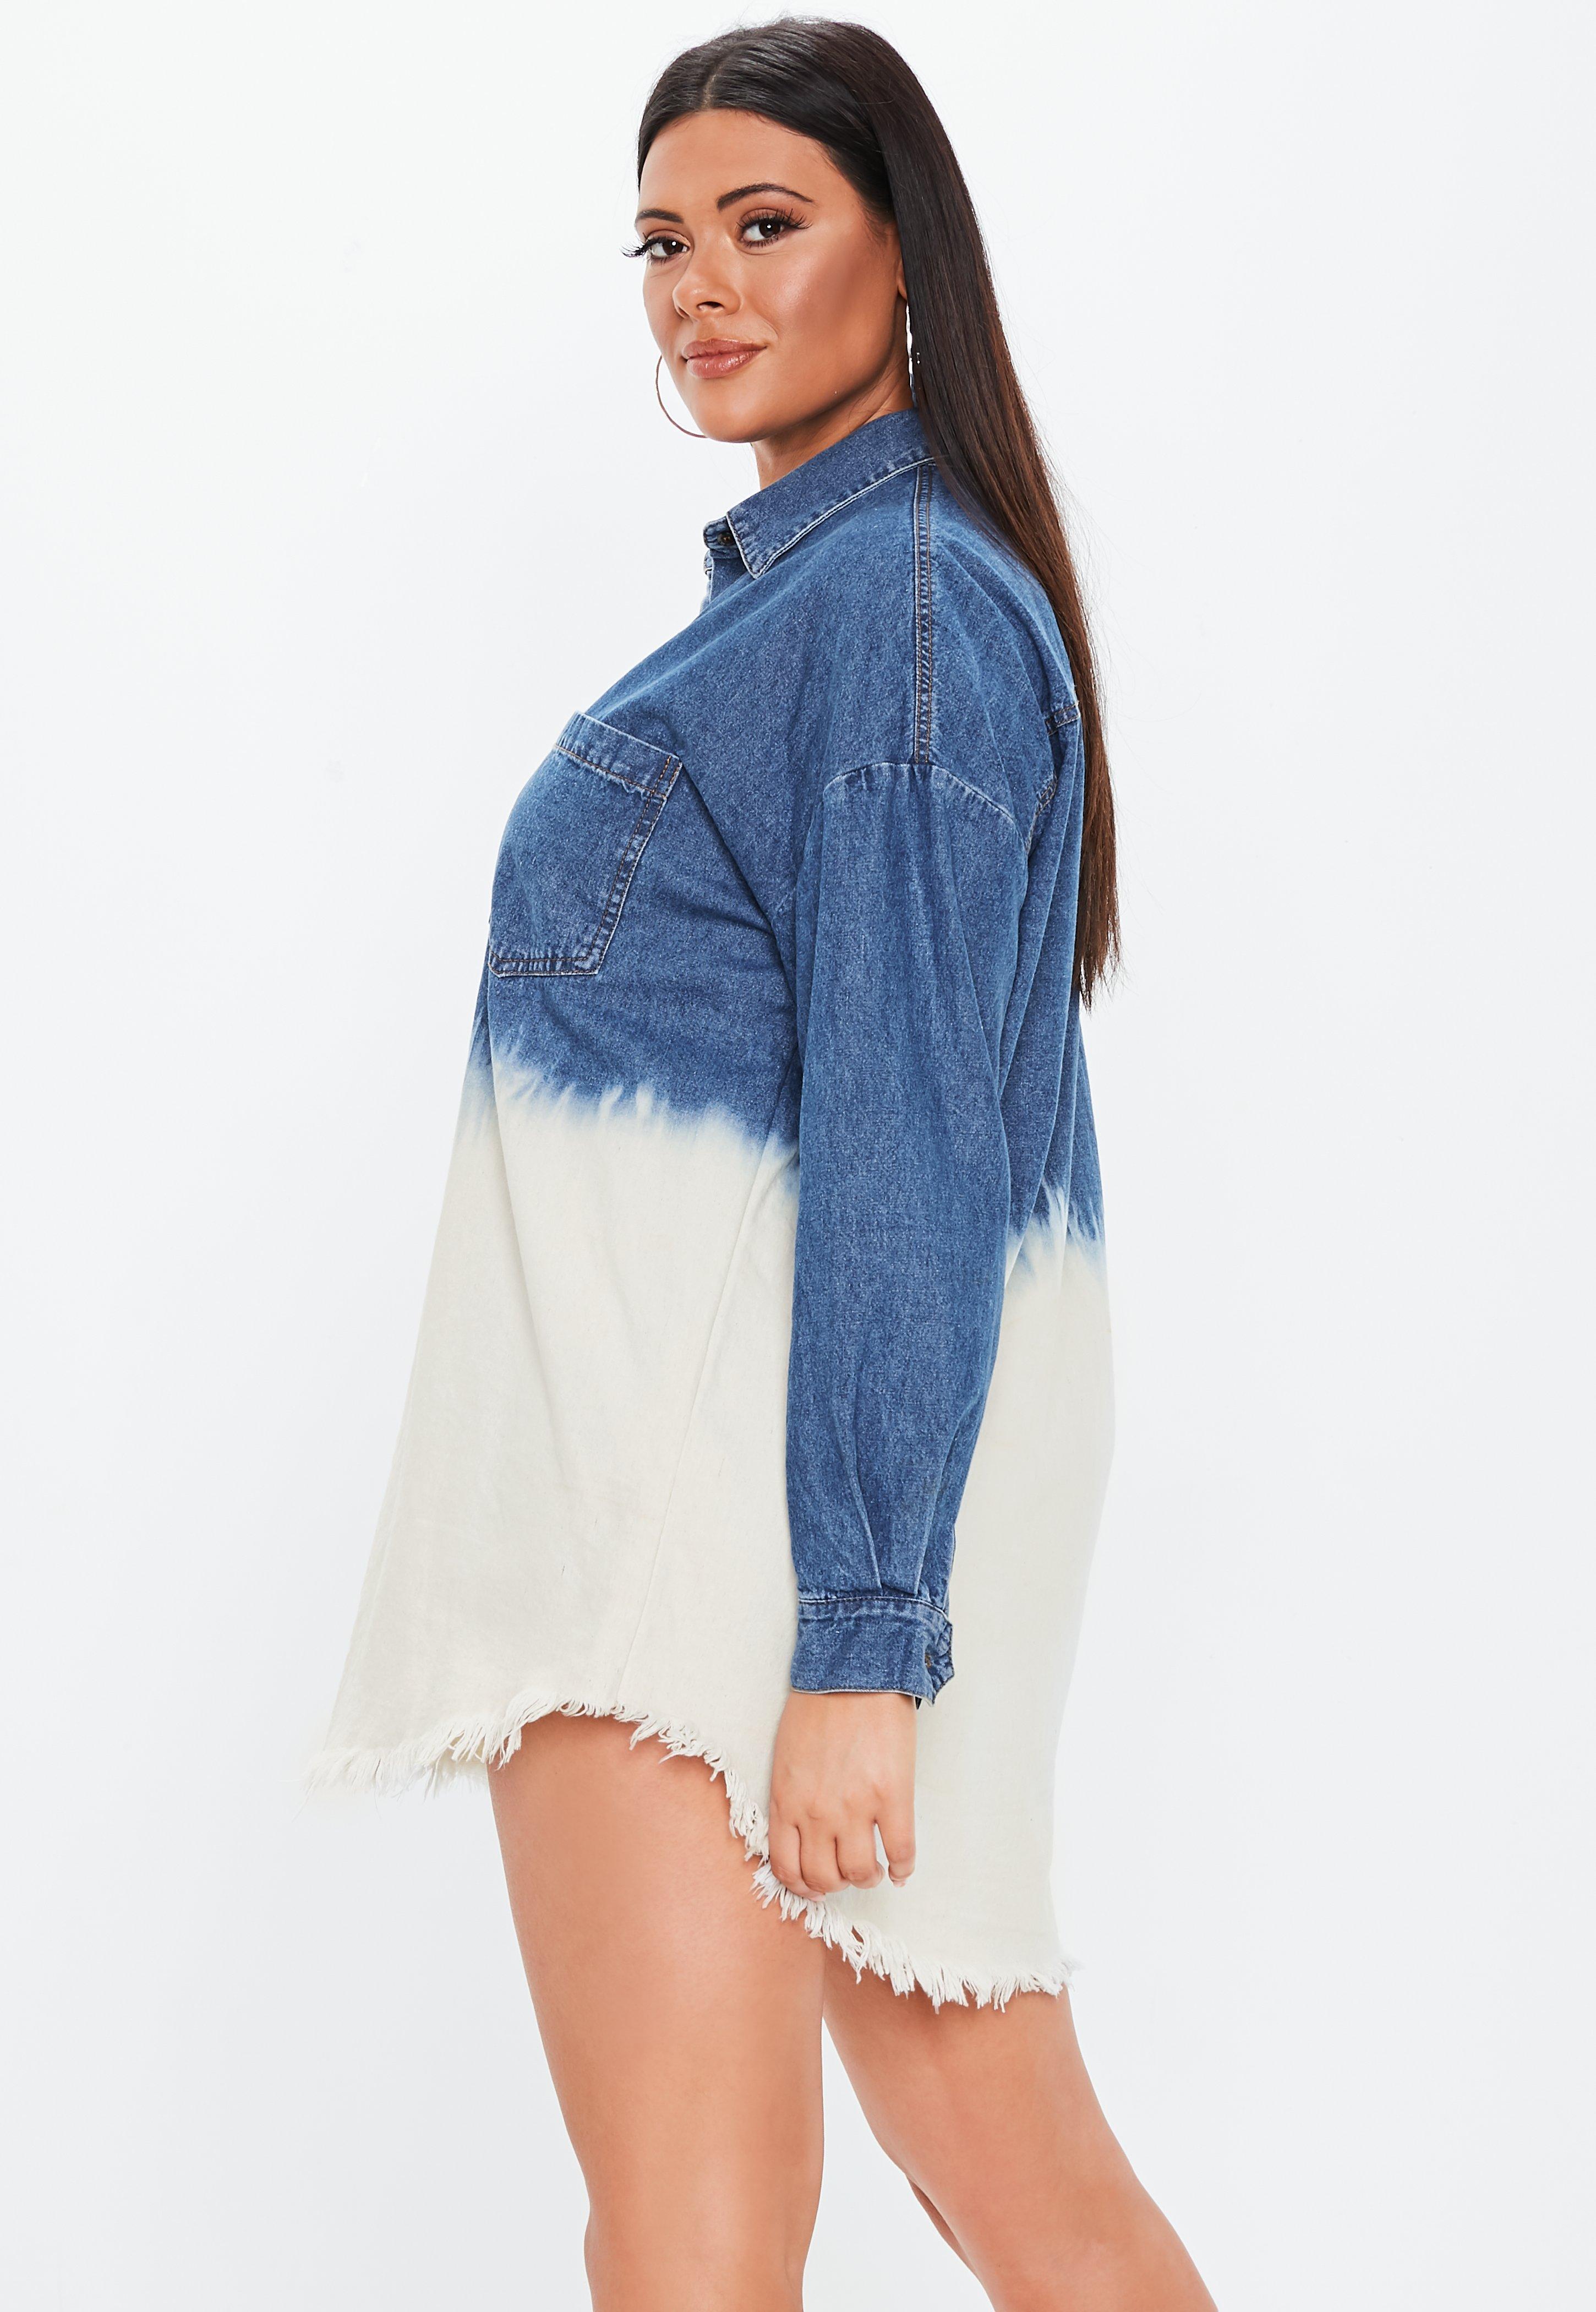 b1c628e0dd Missguided - Plus Size Blue Oversized Dip Dye Denim Shirt Dress - Lyst.  View fullscreen